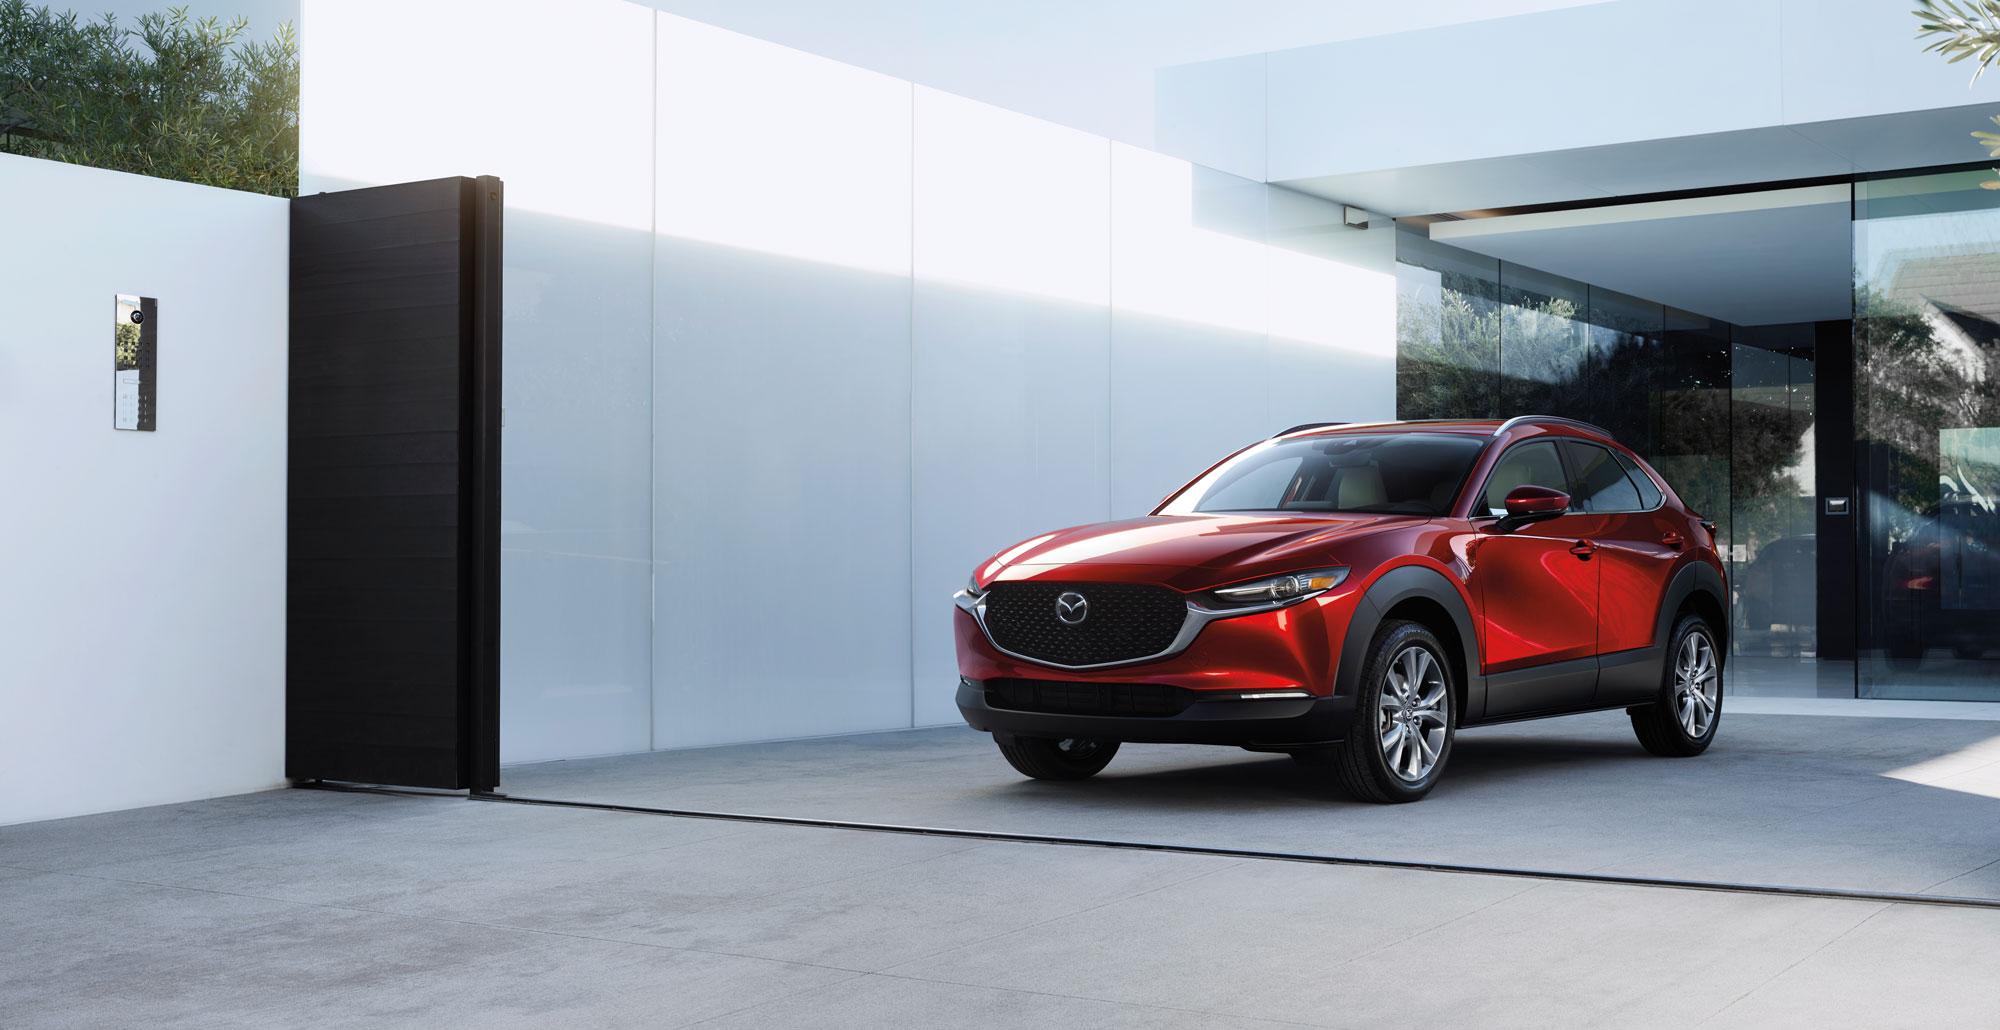 2021 Mazda Cx 9 Rumors History